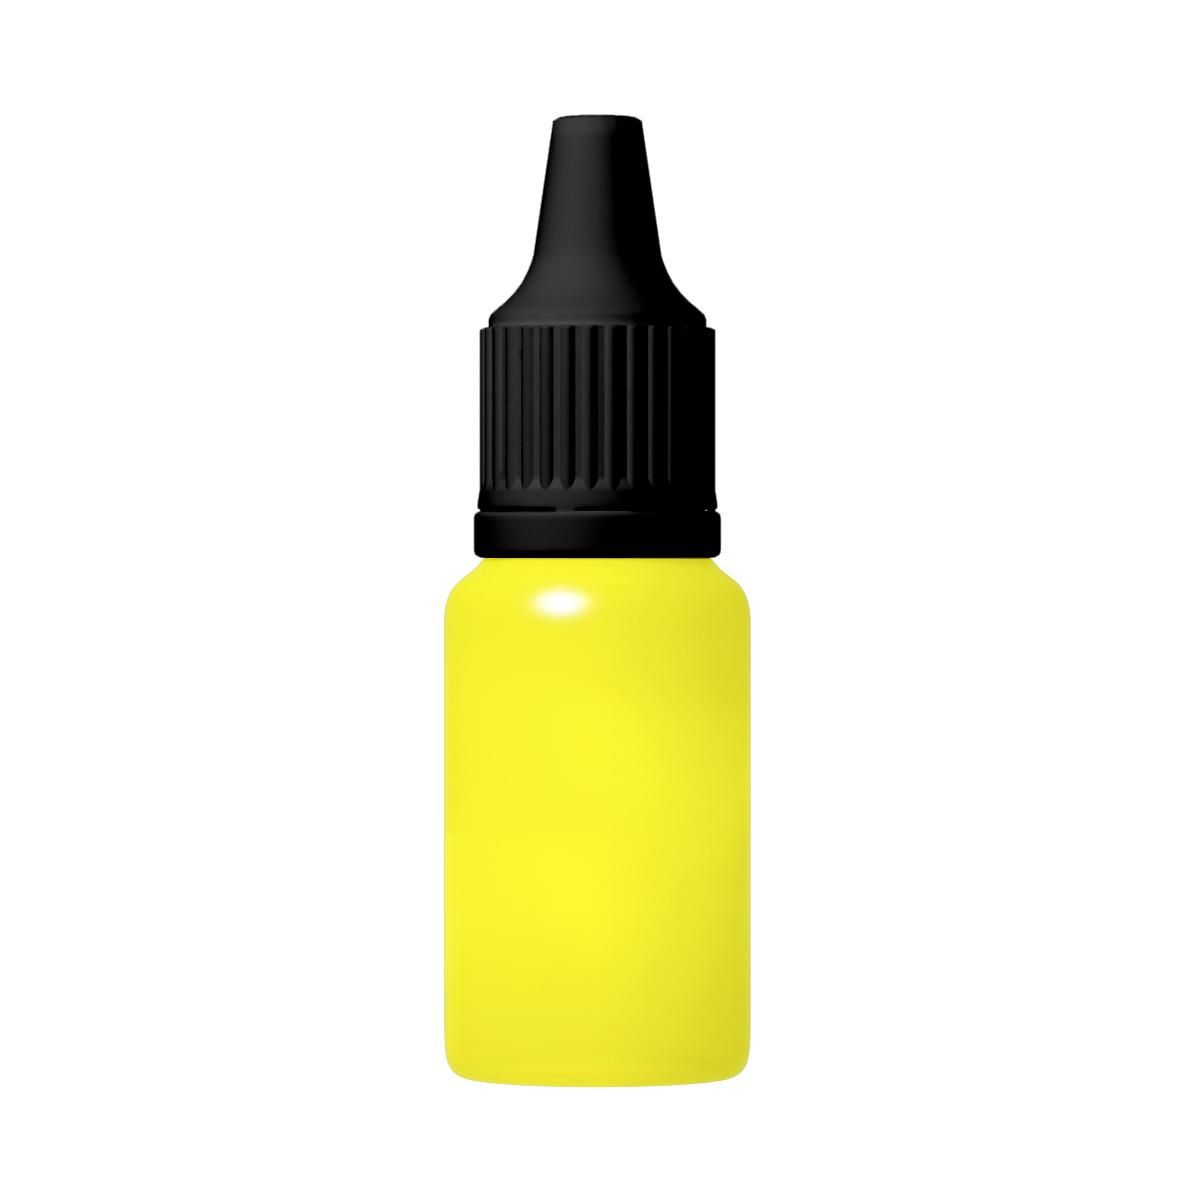 TFC Giessharz Farbpaste RAL1016 schwefelgelb